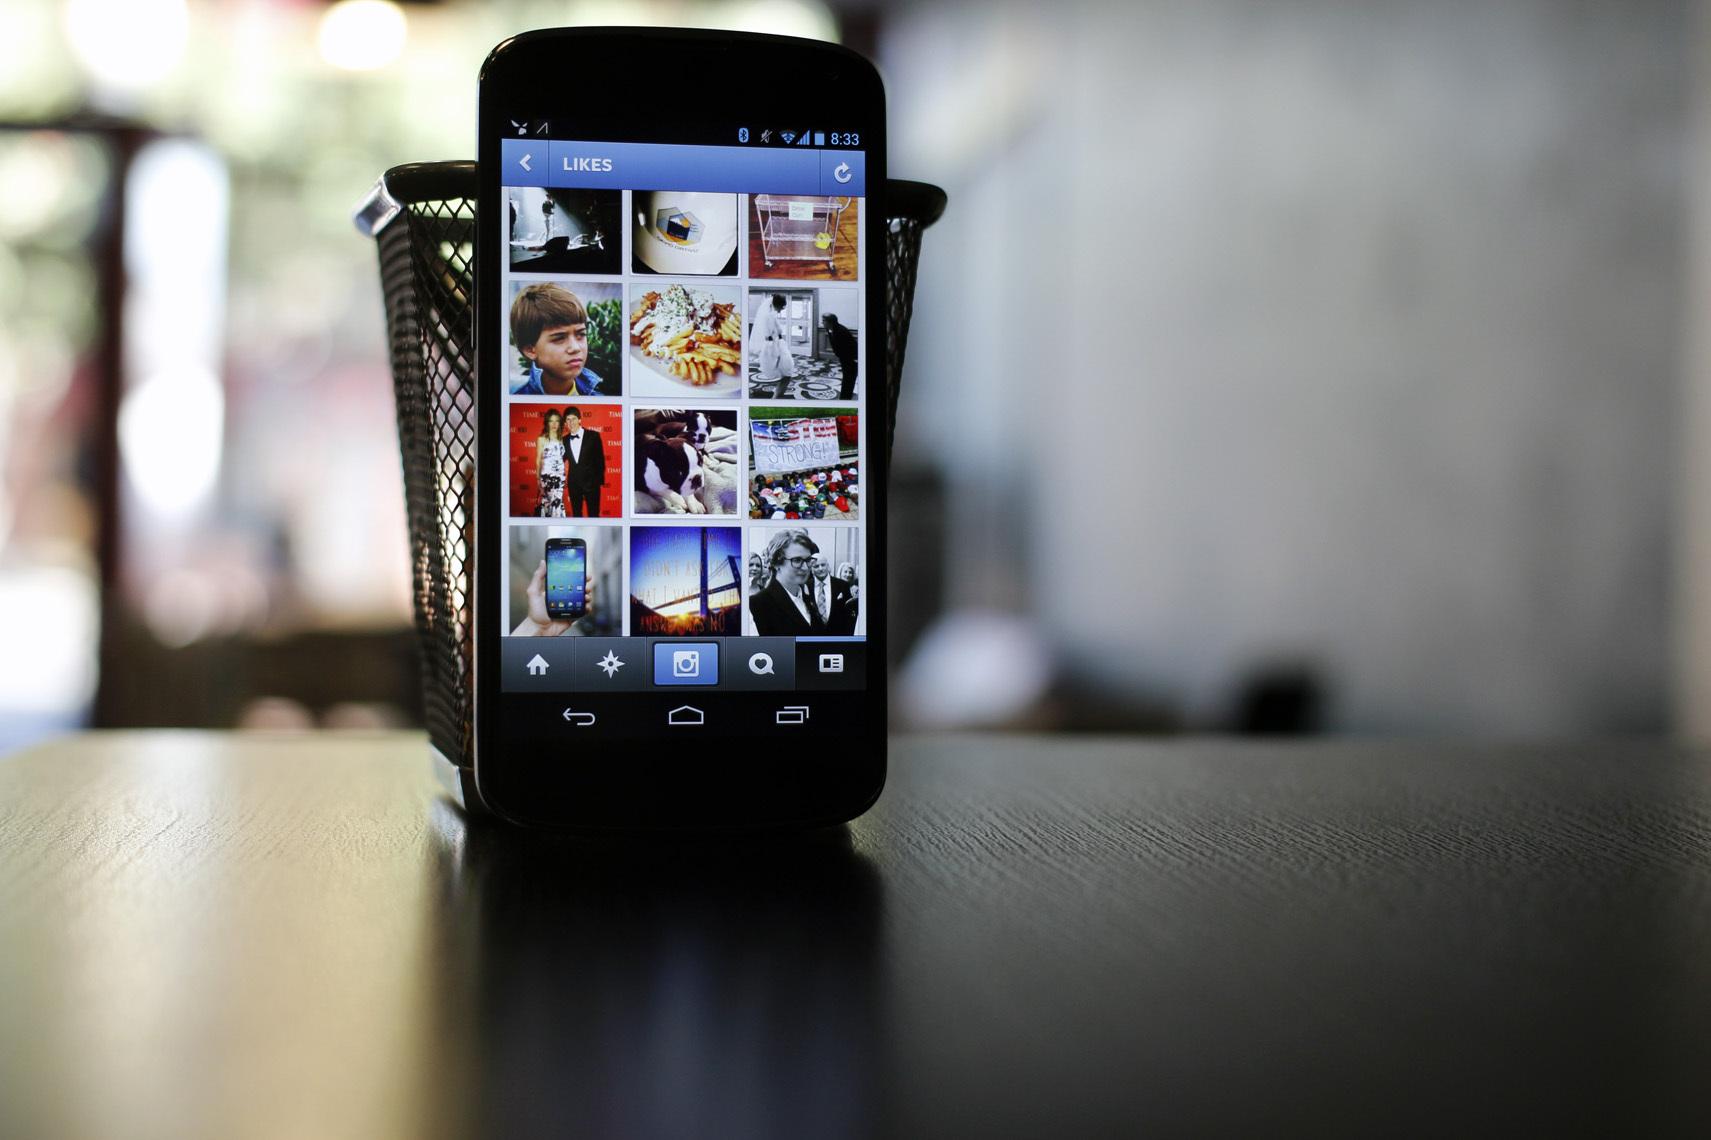 Liiinks Agence de communication Instagram Paris